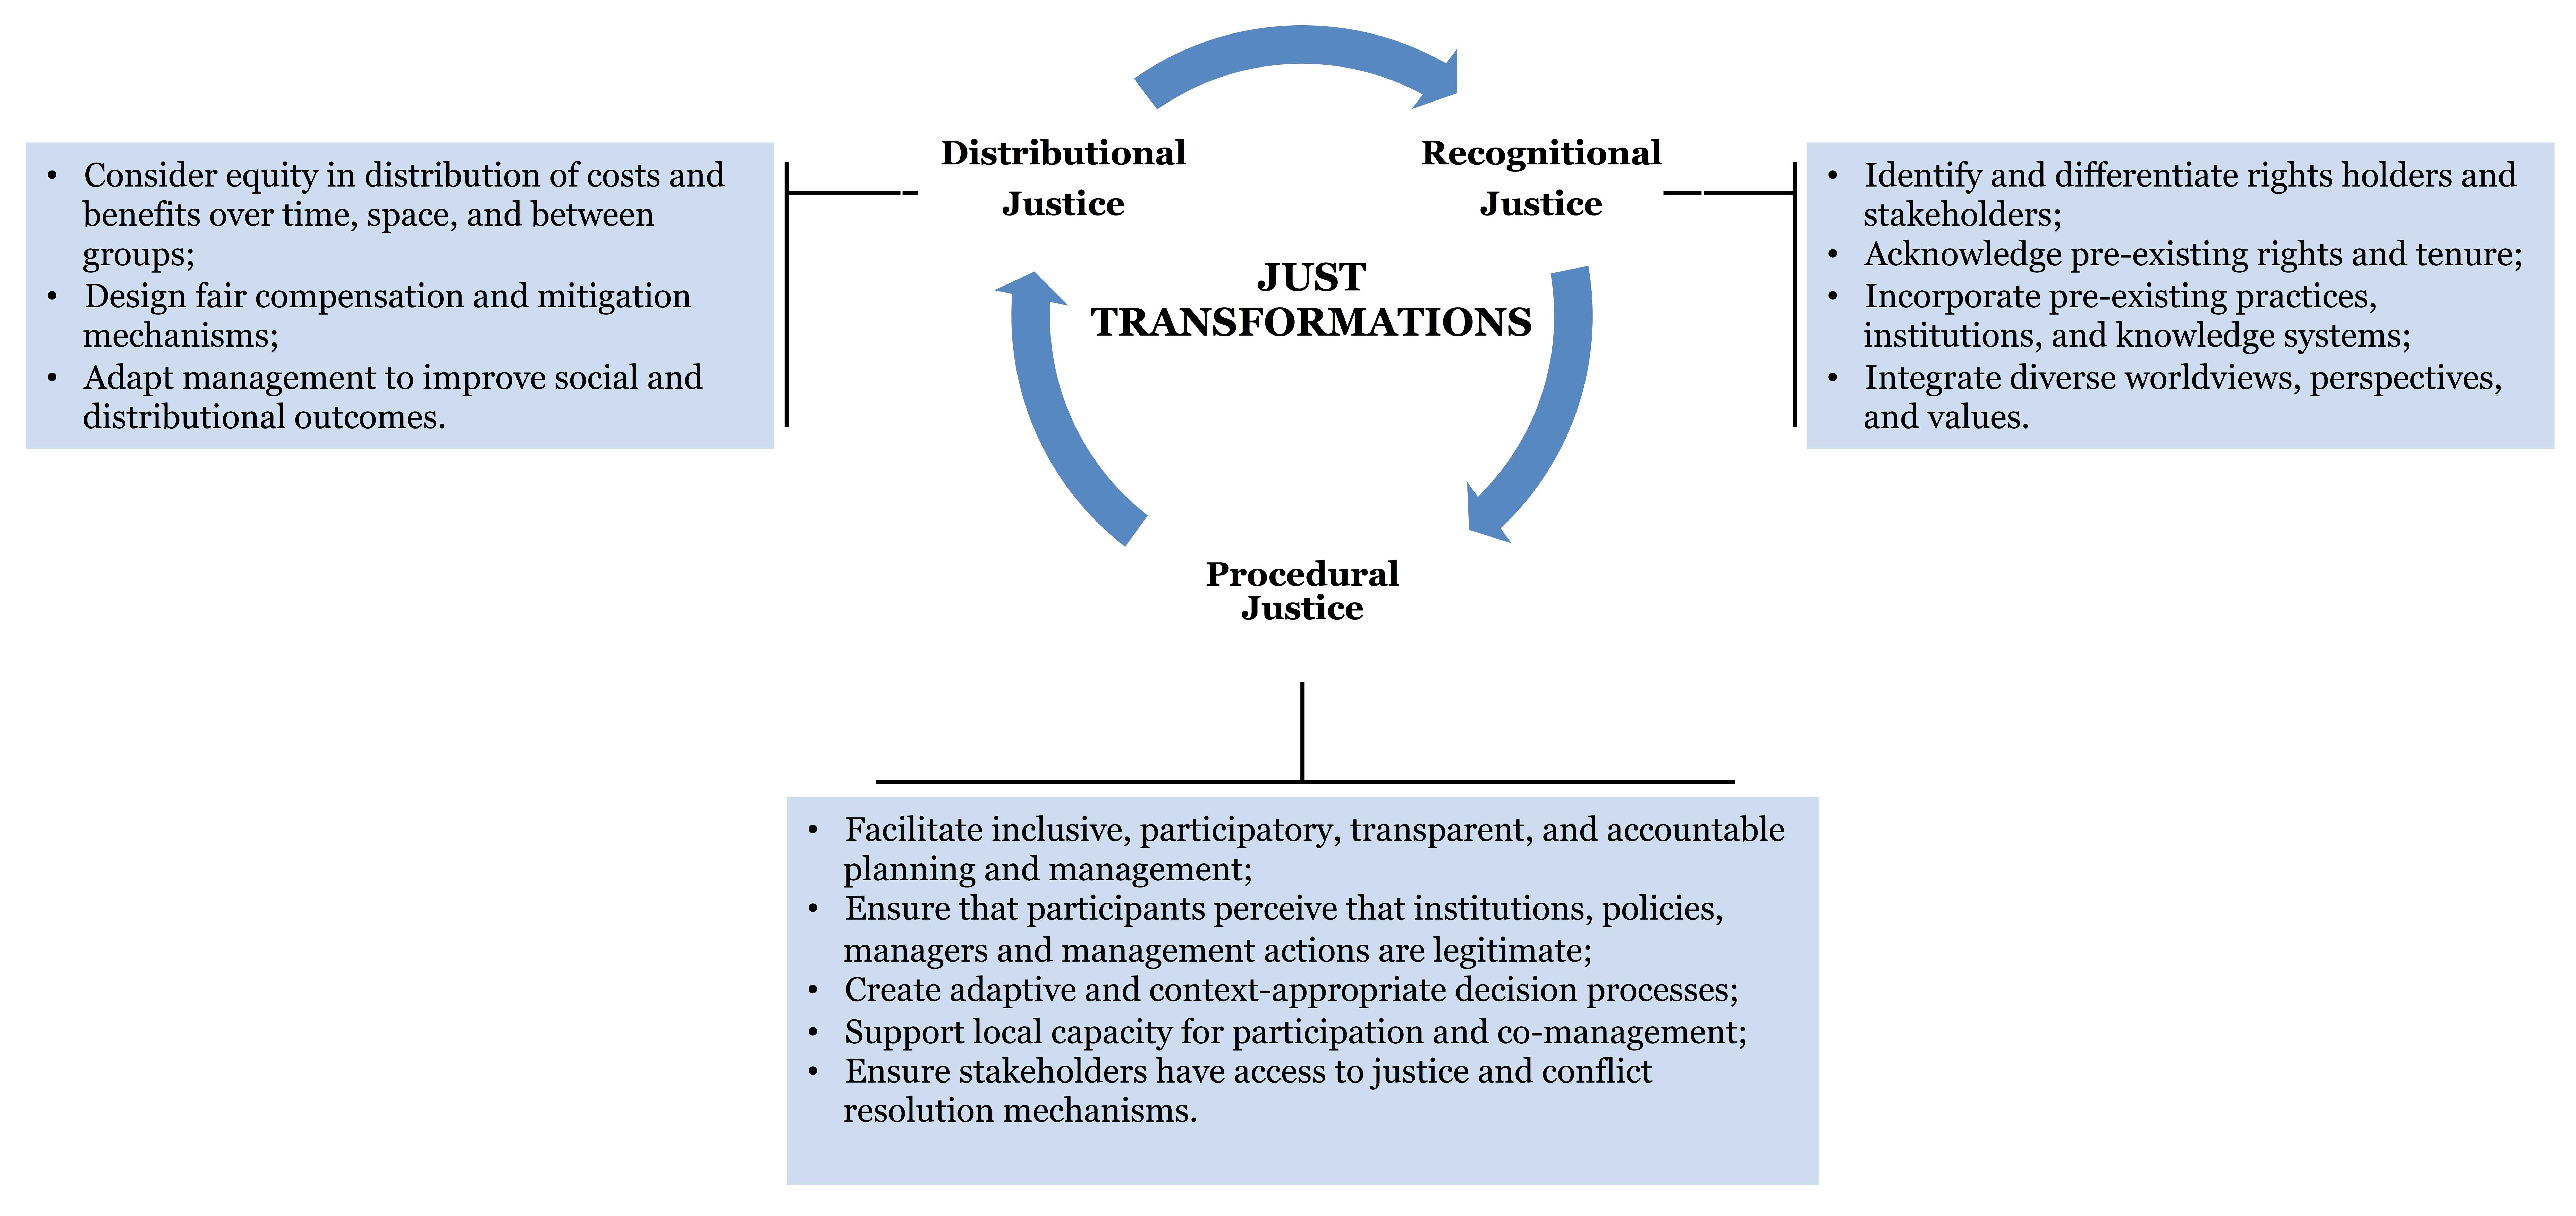 Figure 2 - Just transformation management